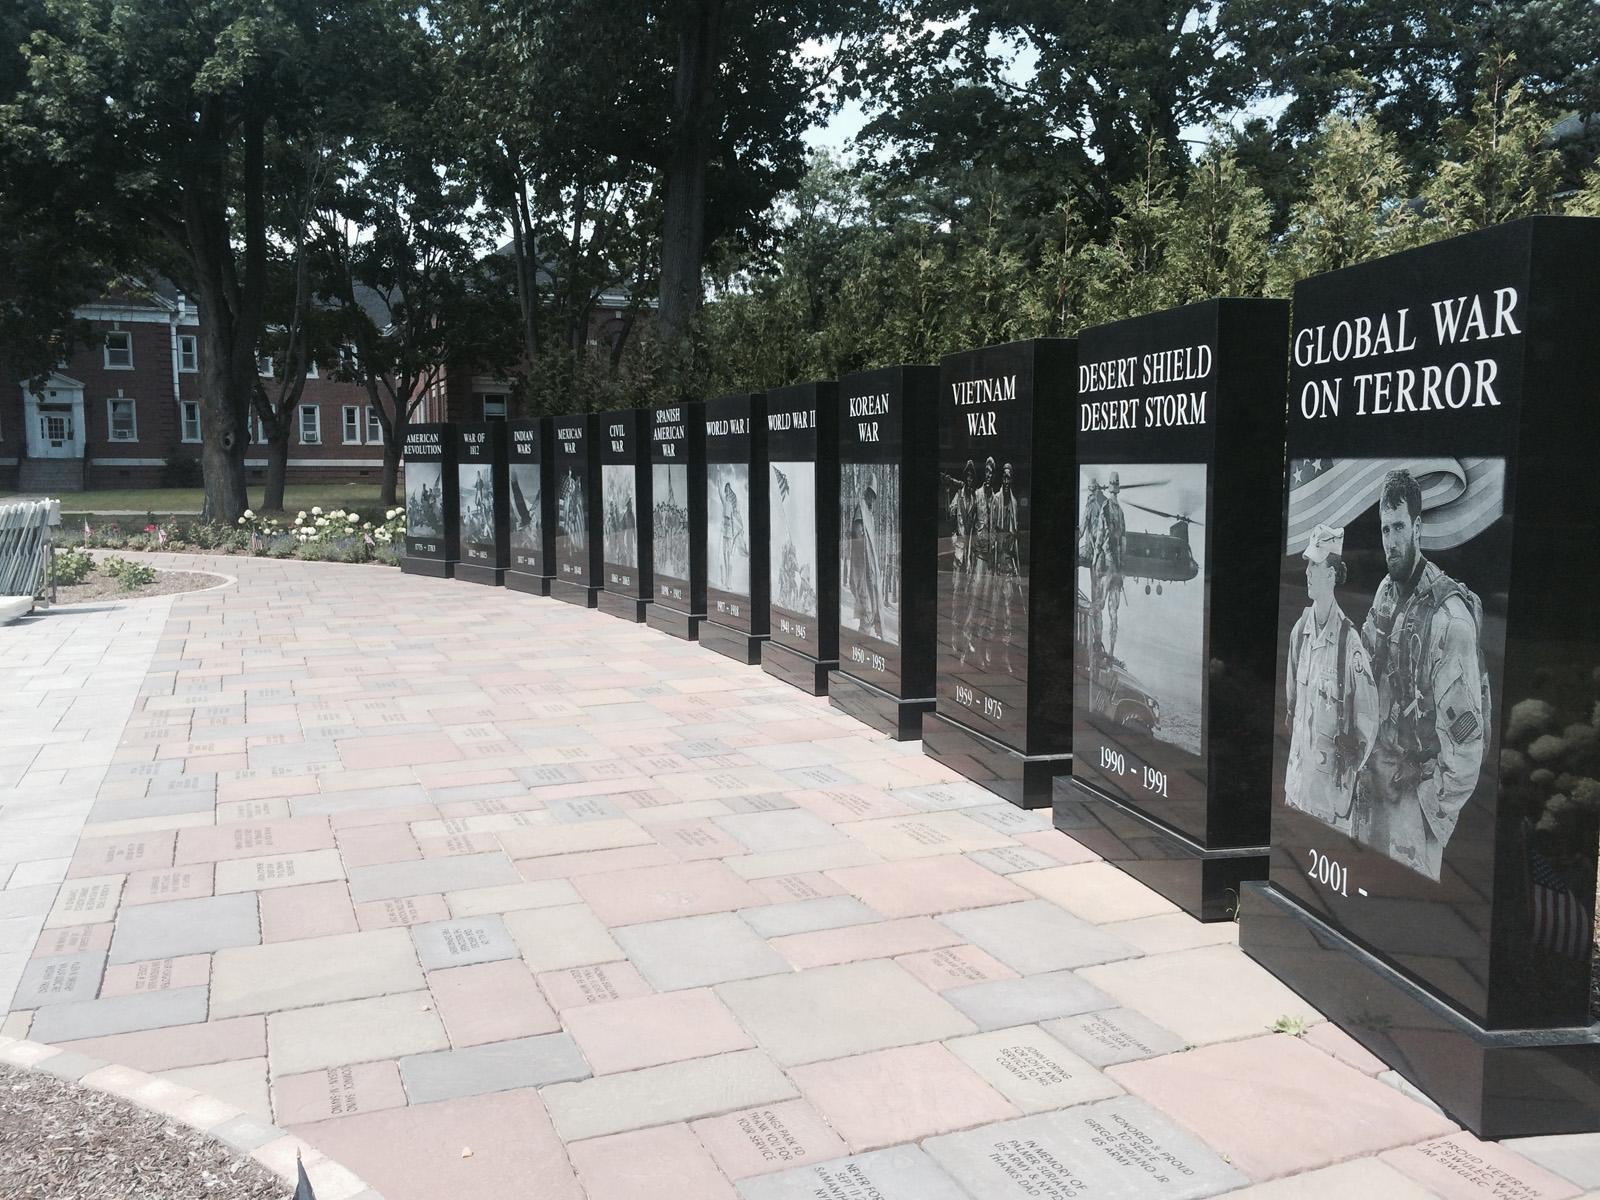 Professional memorial garden paver construction in Long Island, NY